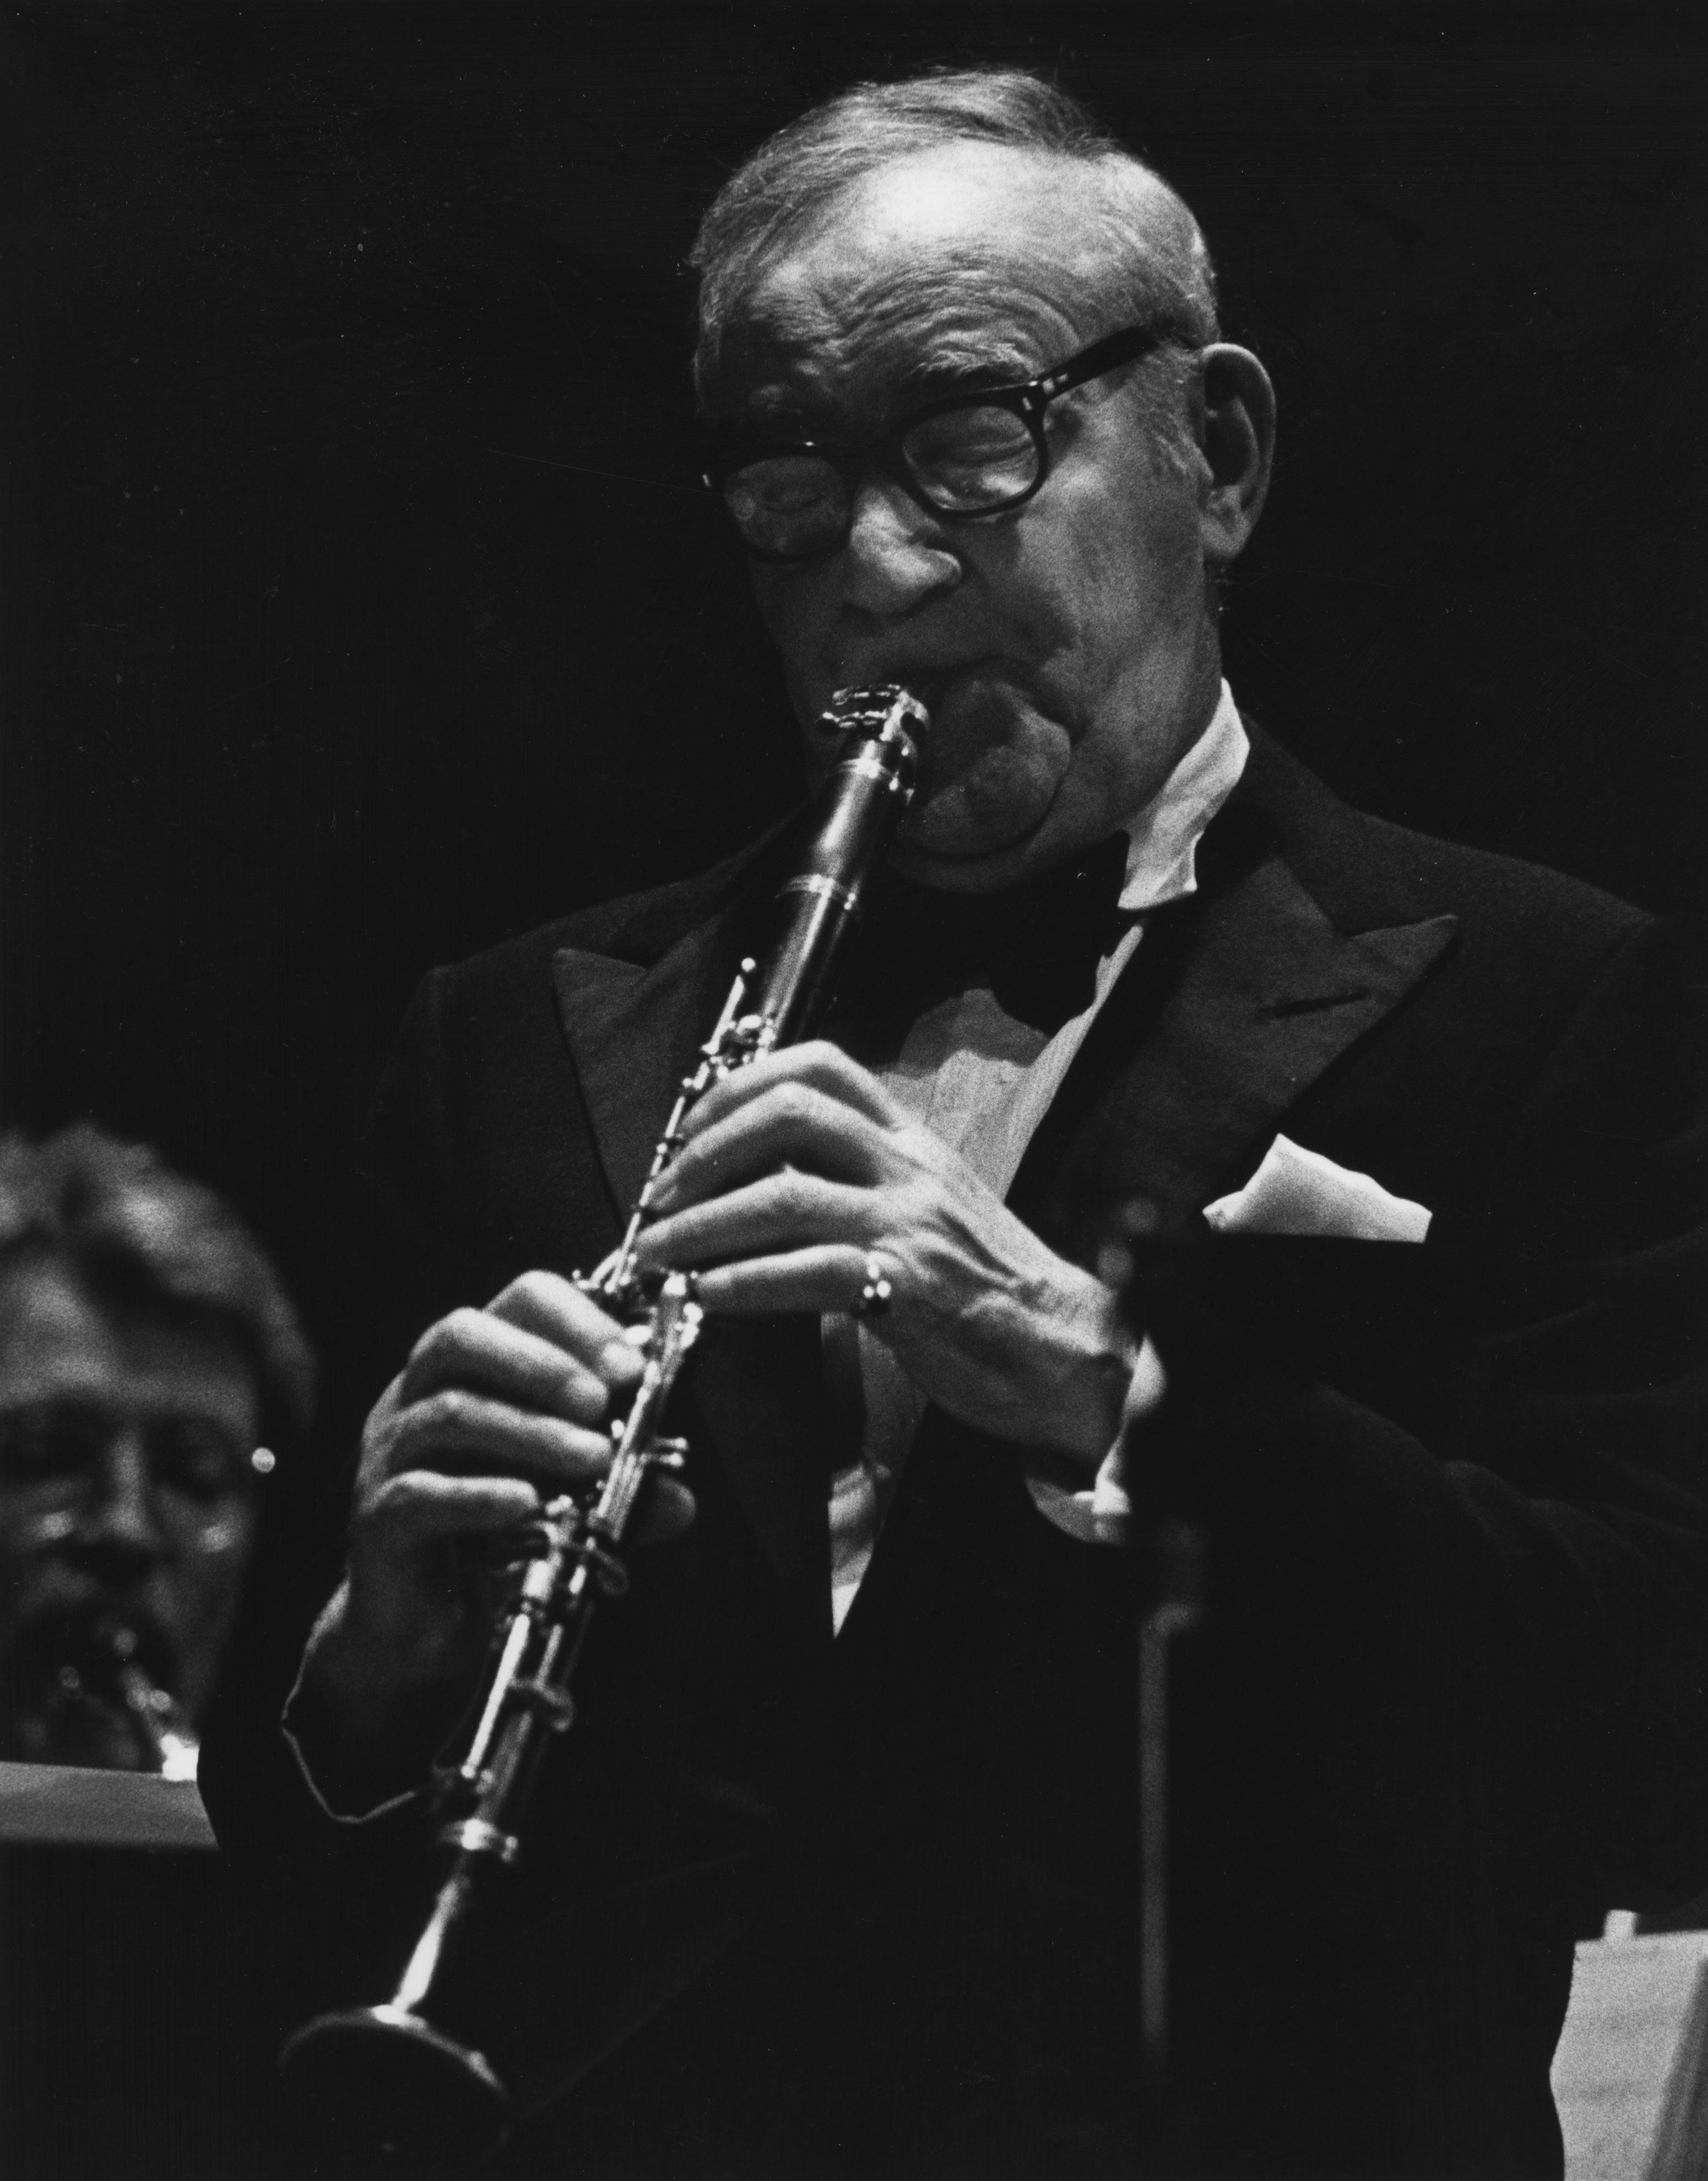 Benny Goodman at Benefit Concert